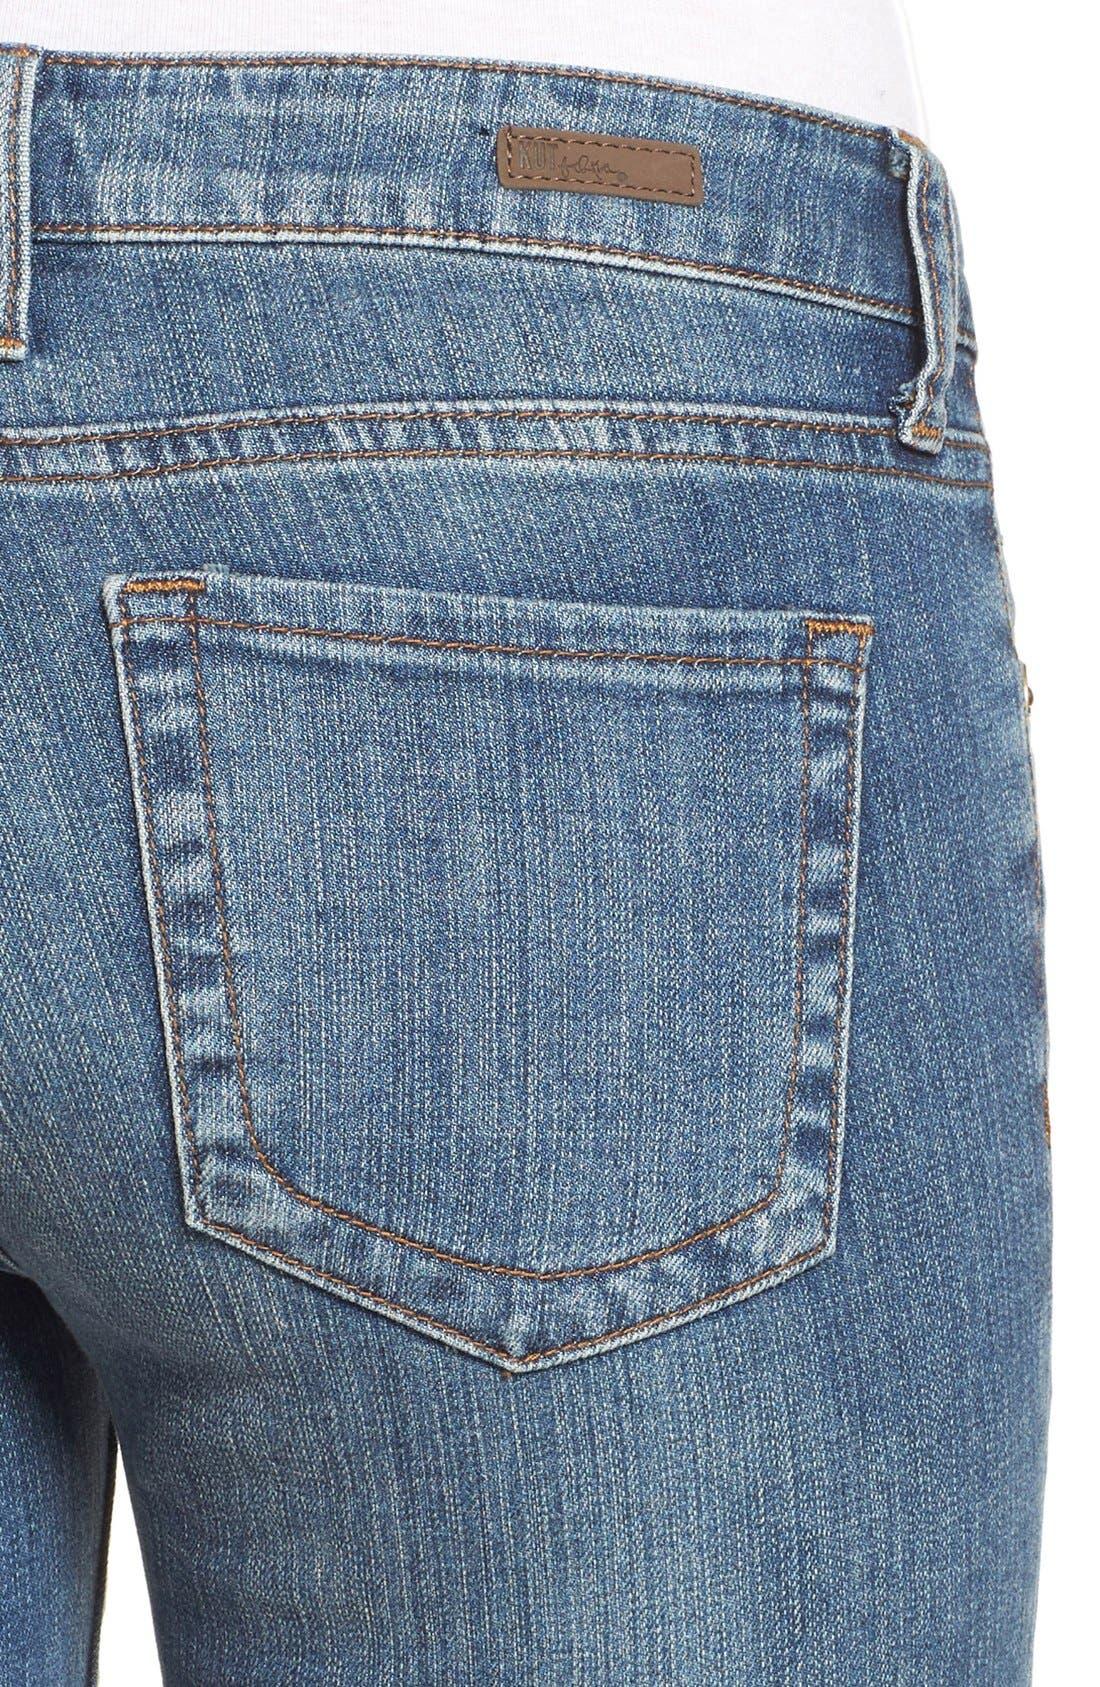 Alternate Image 5  - KUT from the Kloth 'Catherine' Slim Boyfriend Jeans (Fervent) (Regular & Petite)